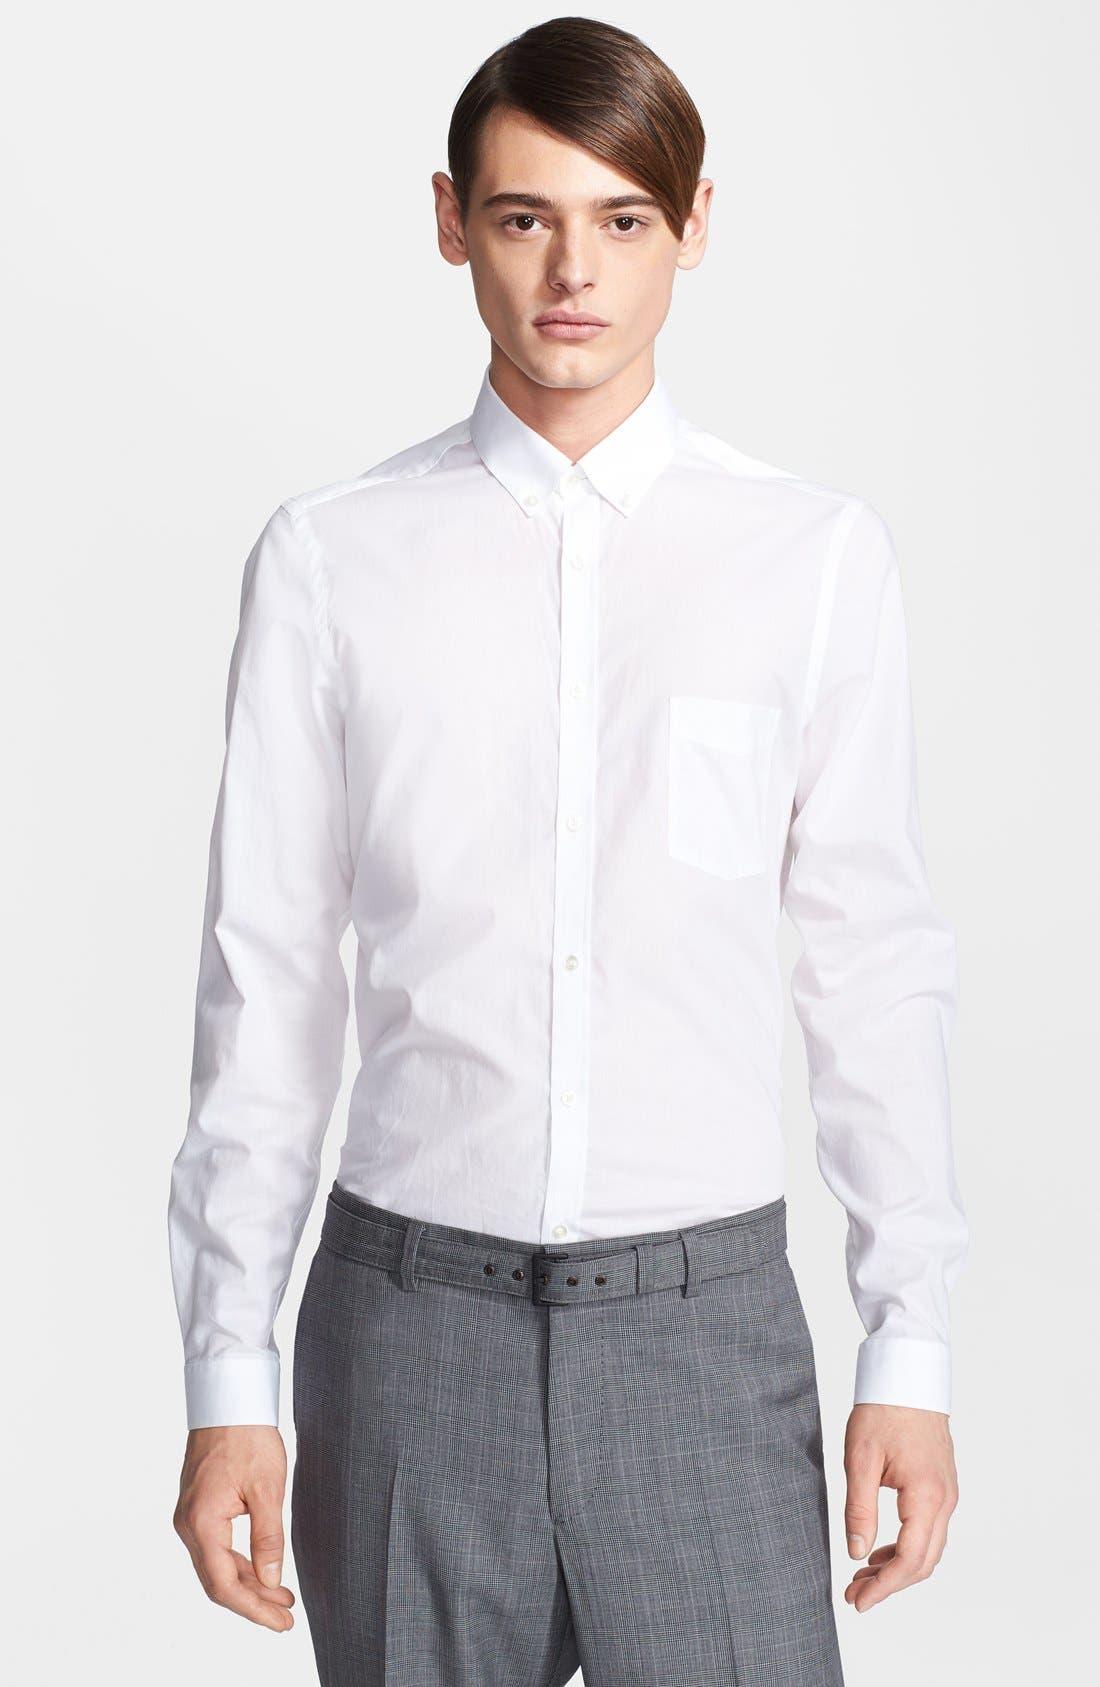 Alternate Image 1 Selected - The Kooples Slim Fit Dress Shirt